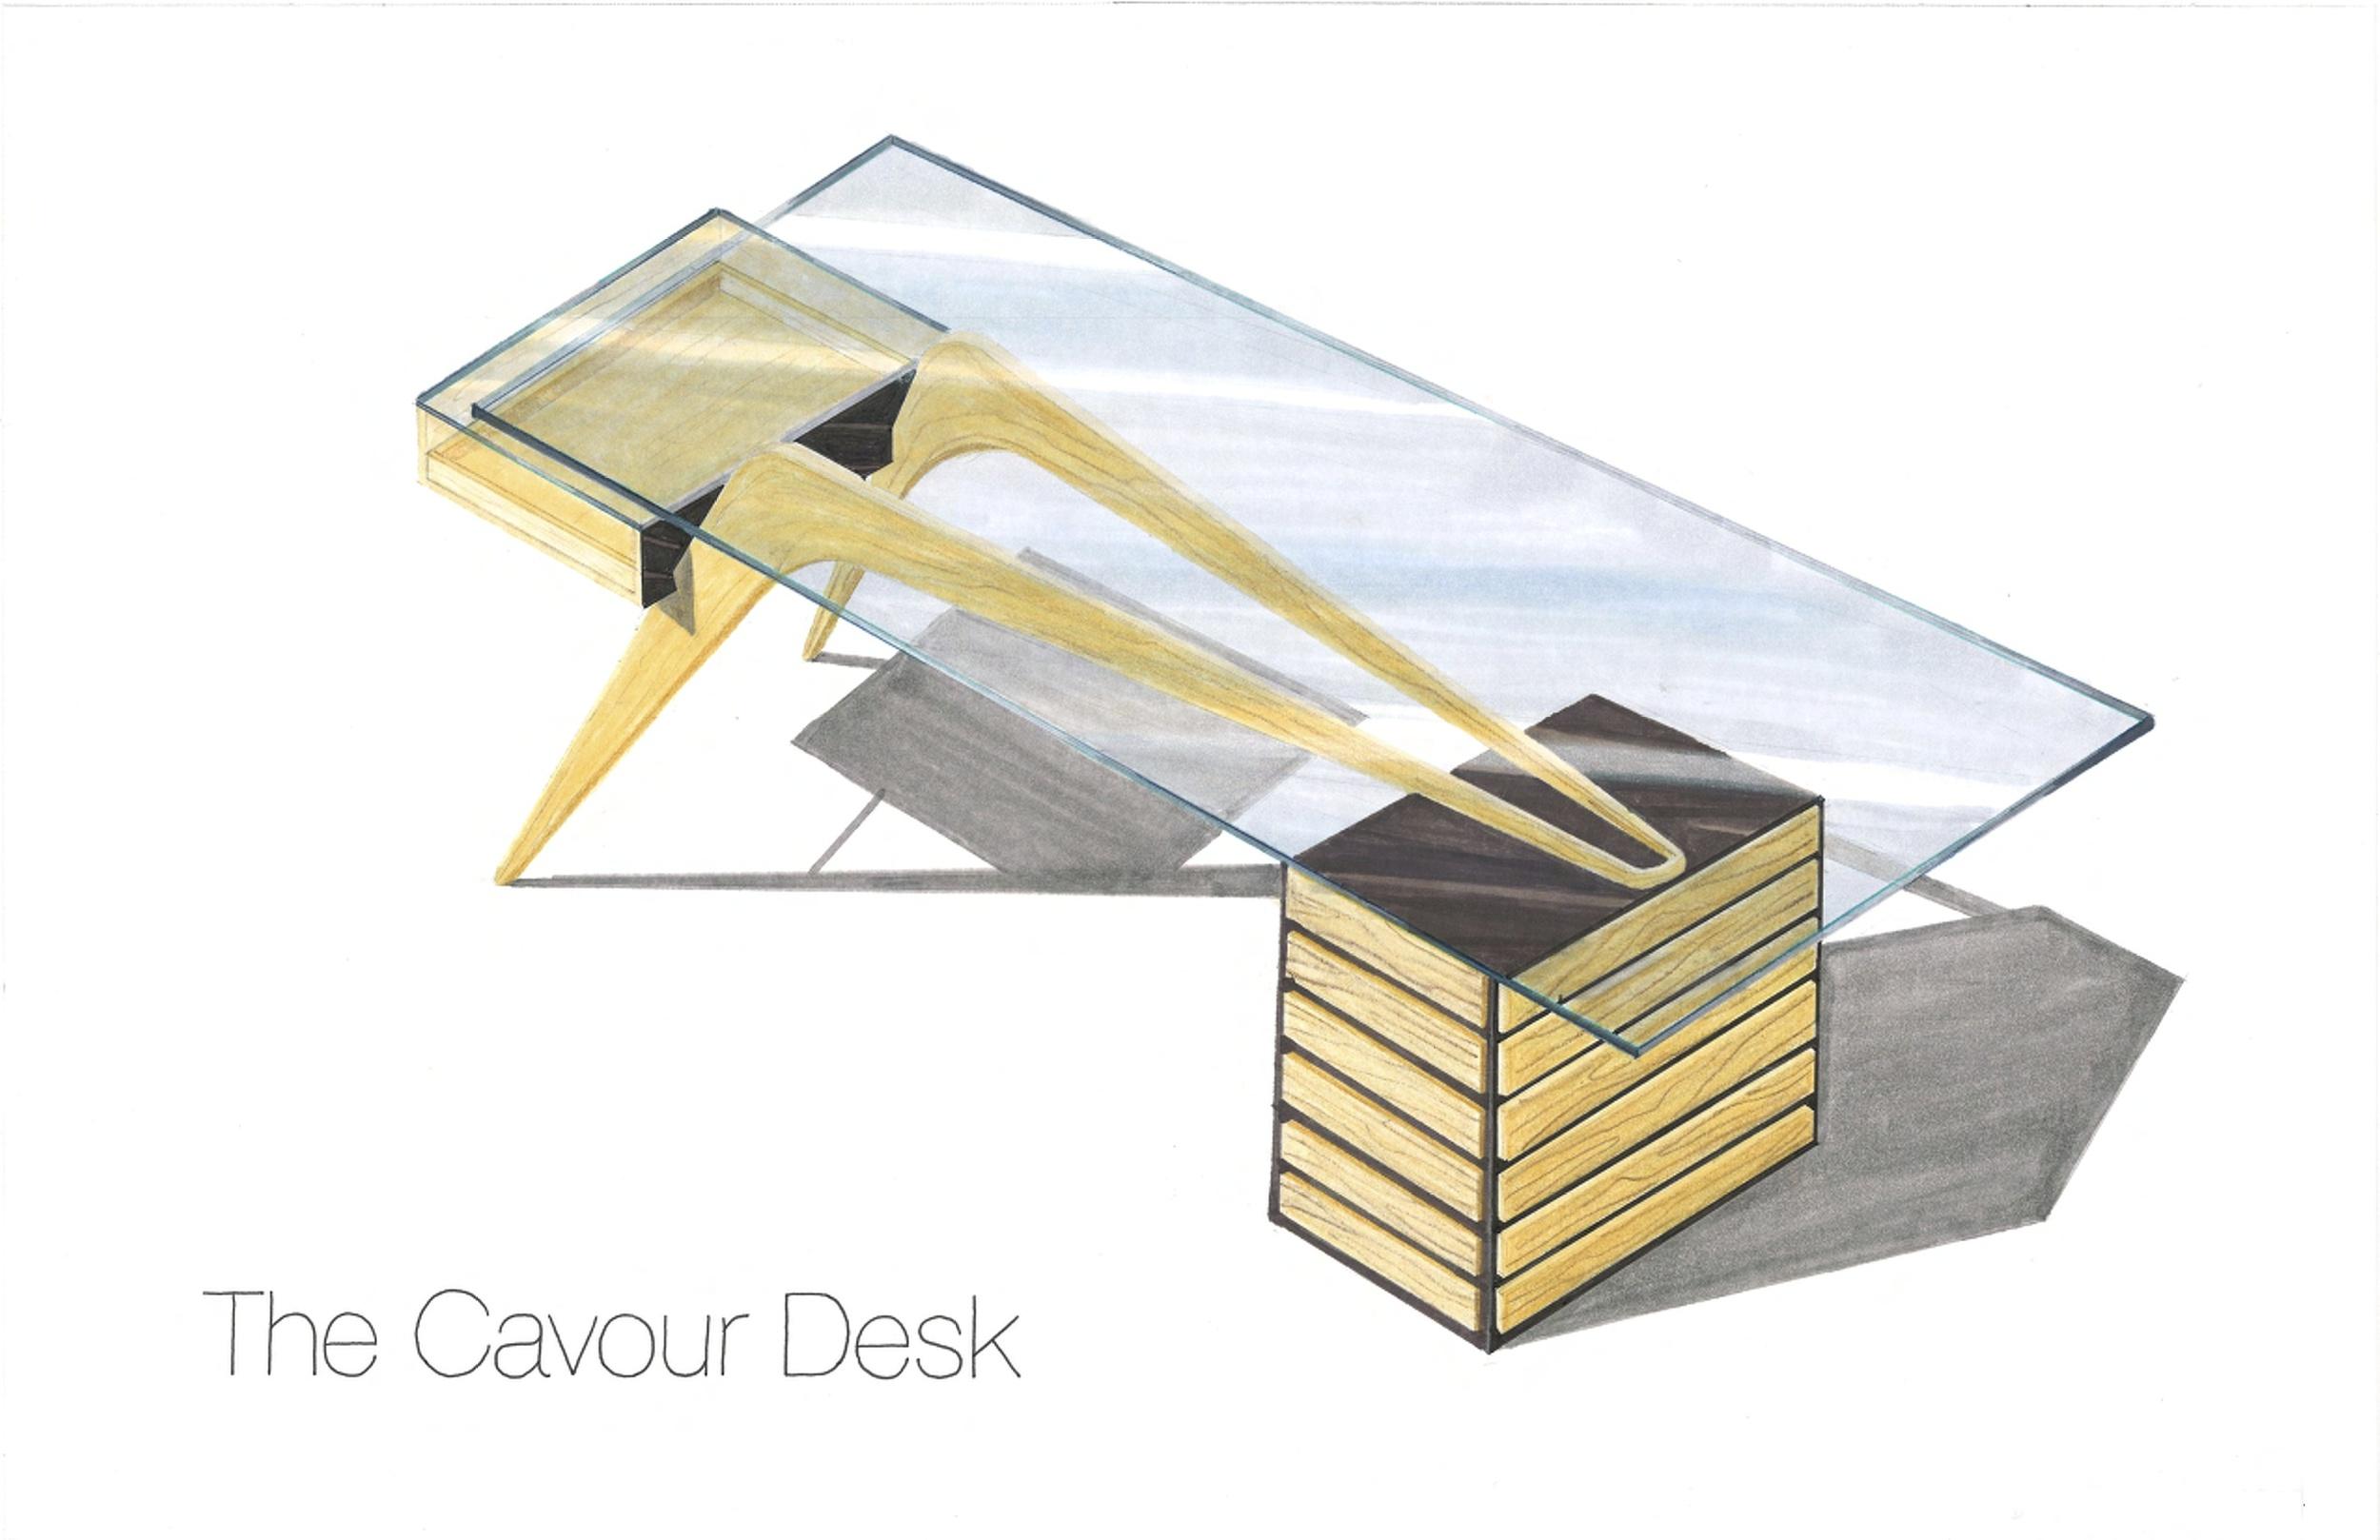 cavour desk scan-11.jpg